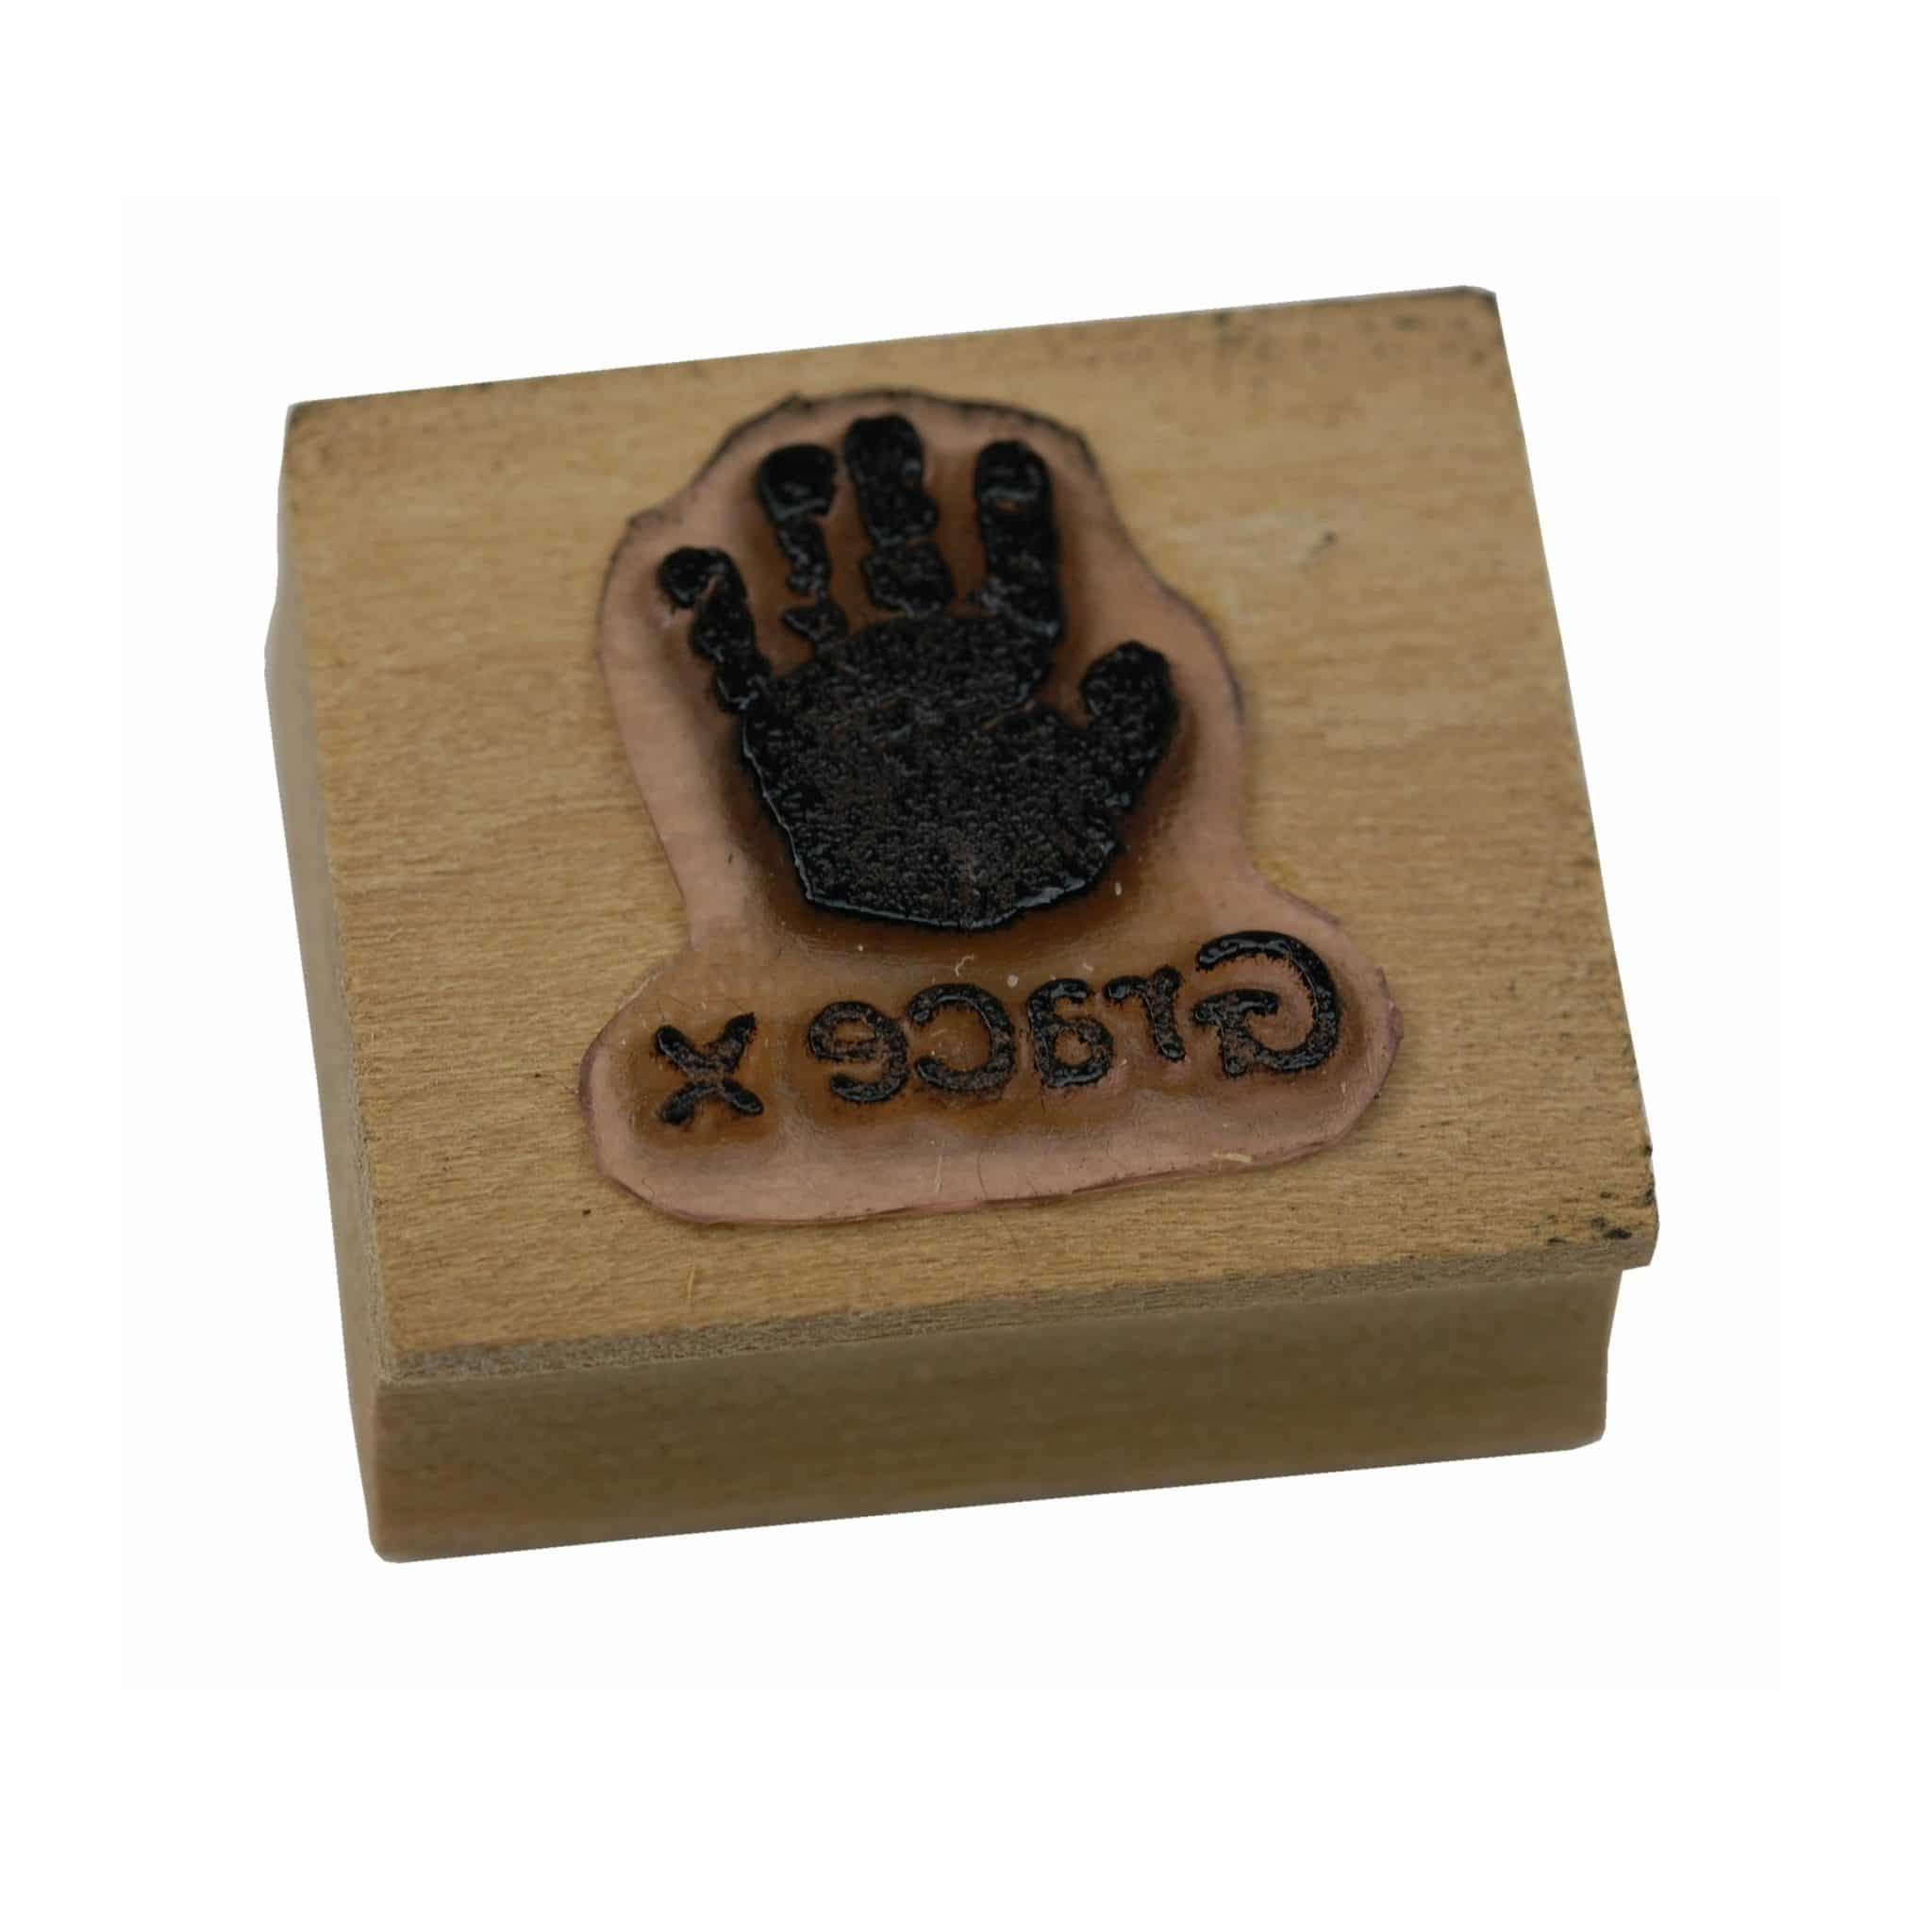 Personalised handprint stamp